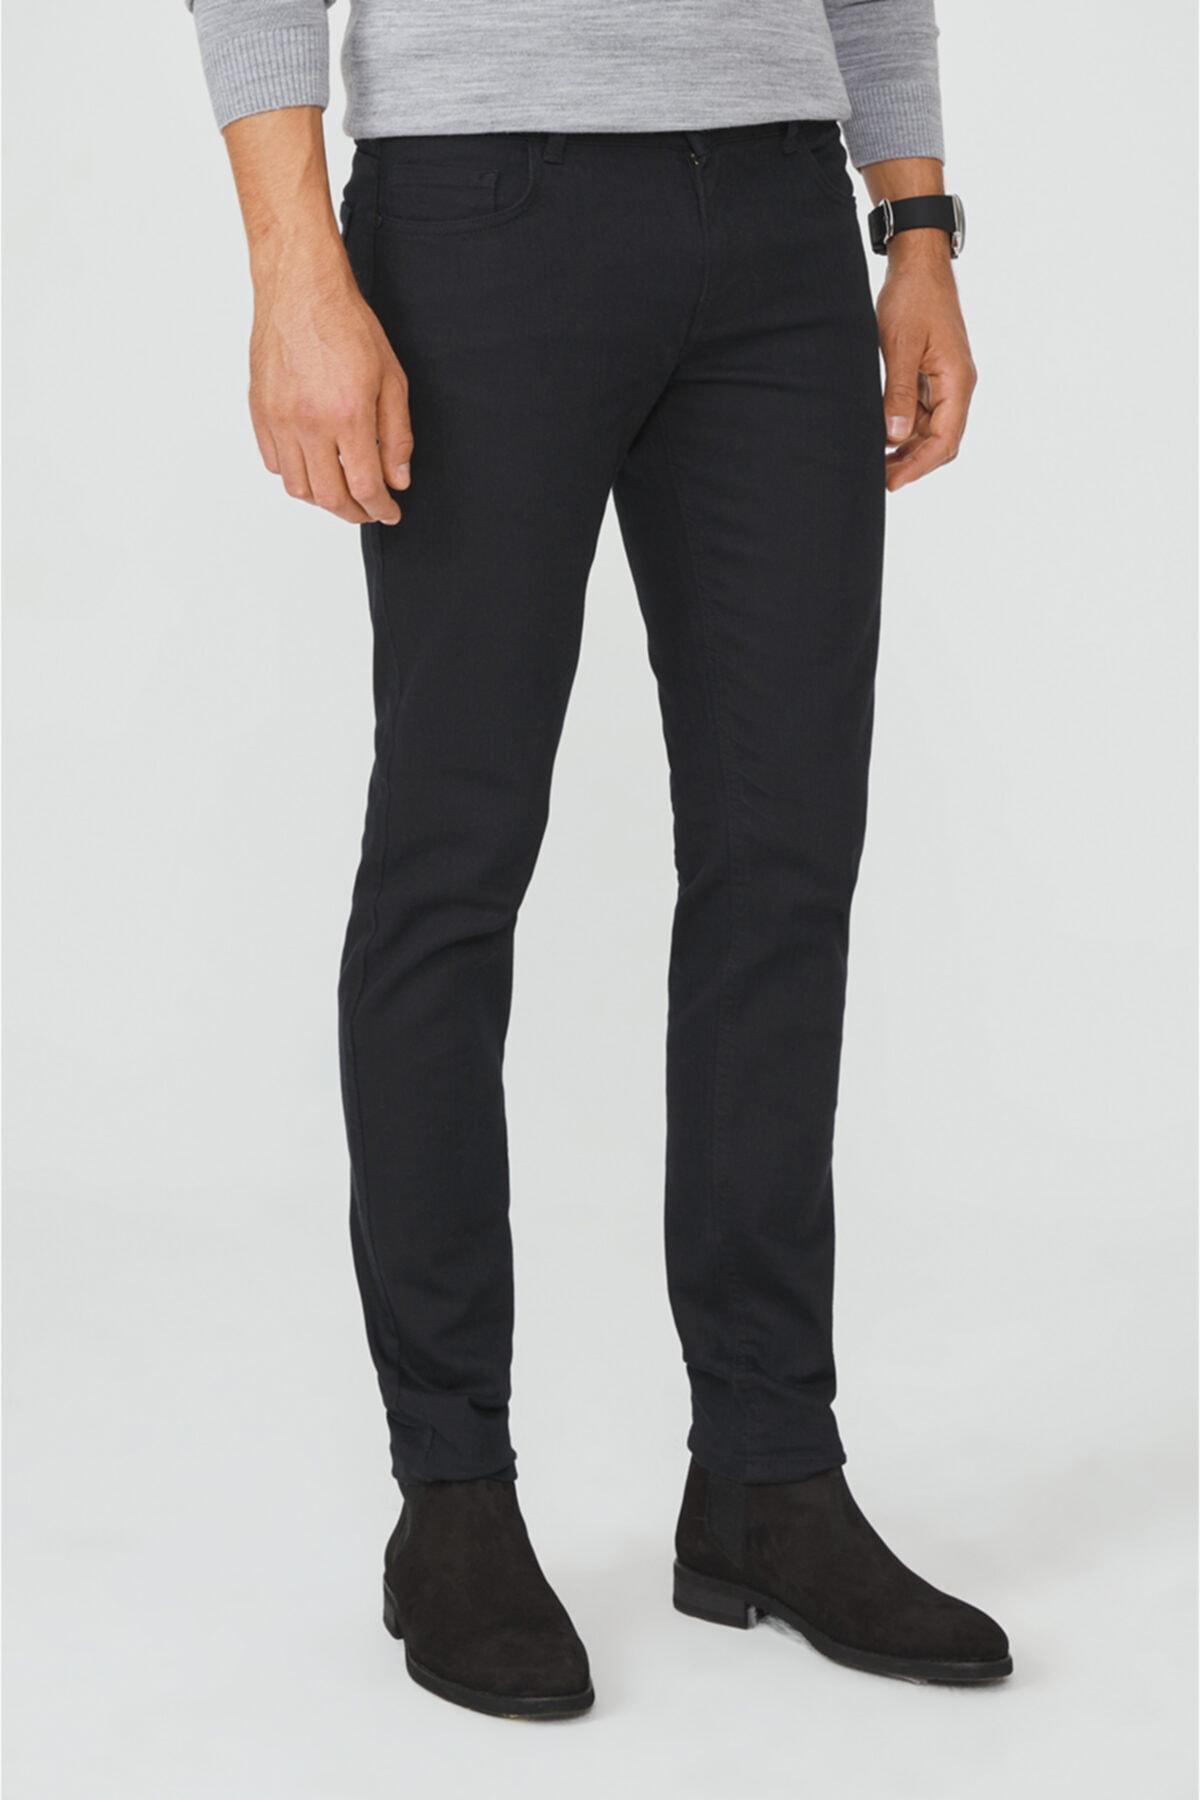 Avva Erkek Siyah 5 Cepli Slim Fit Pantolon A02y3055 1